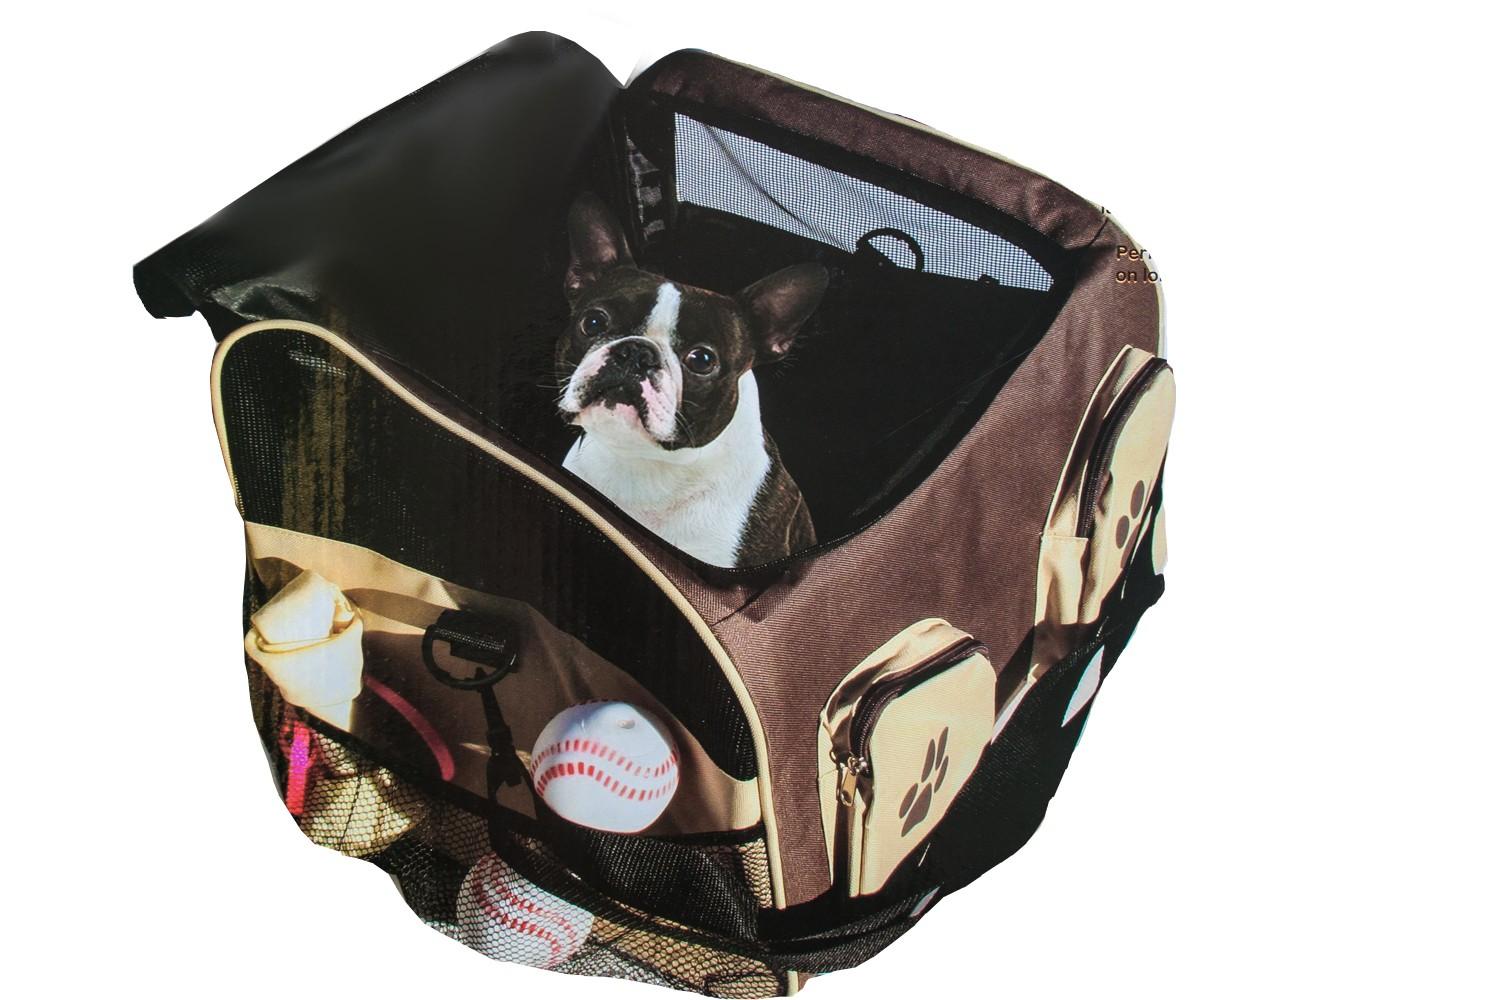 hunde katzen autositz hundesitz tragetasche transportbox. Black Bedroom Furniture Sets. Home Design Ideas